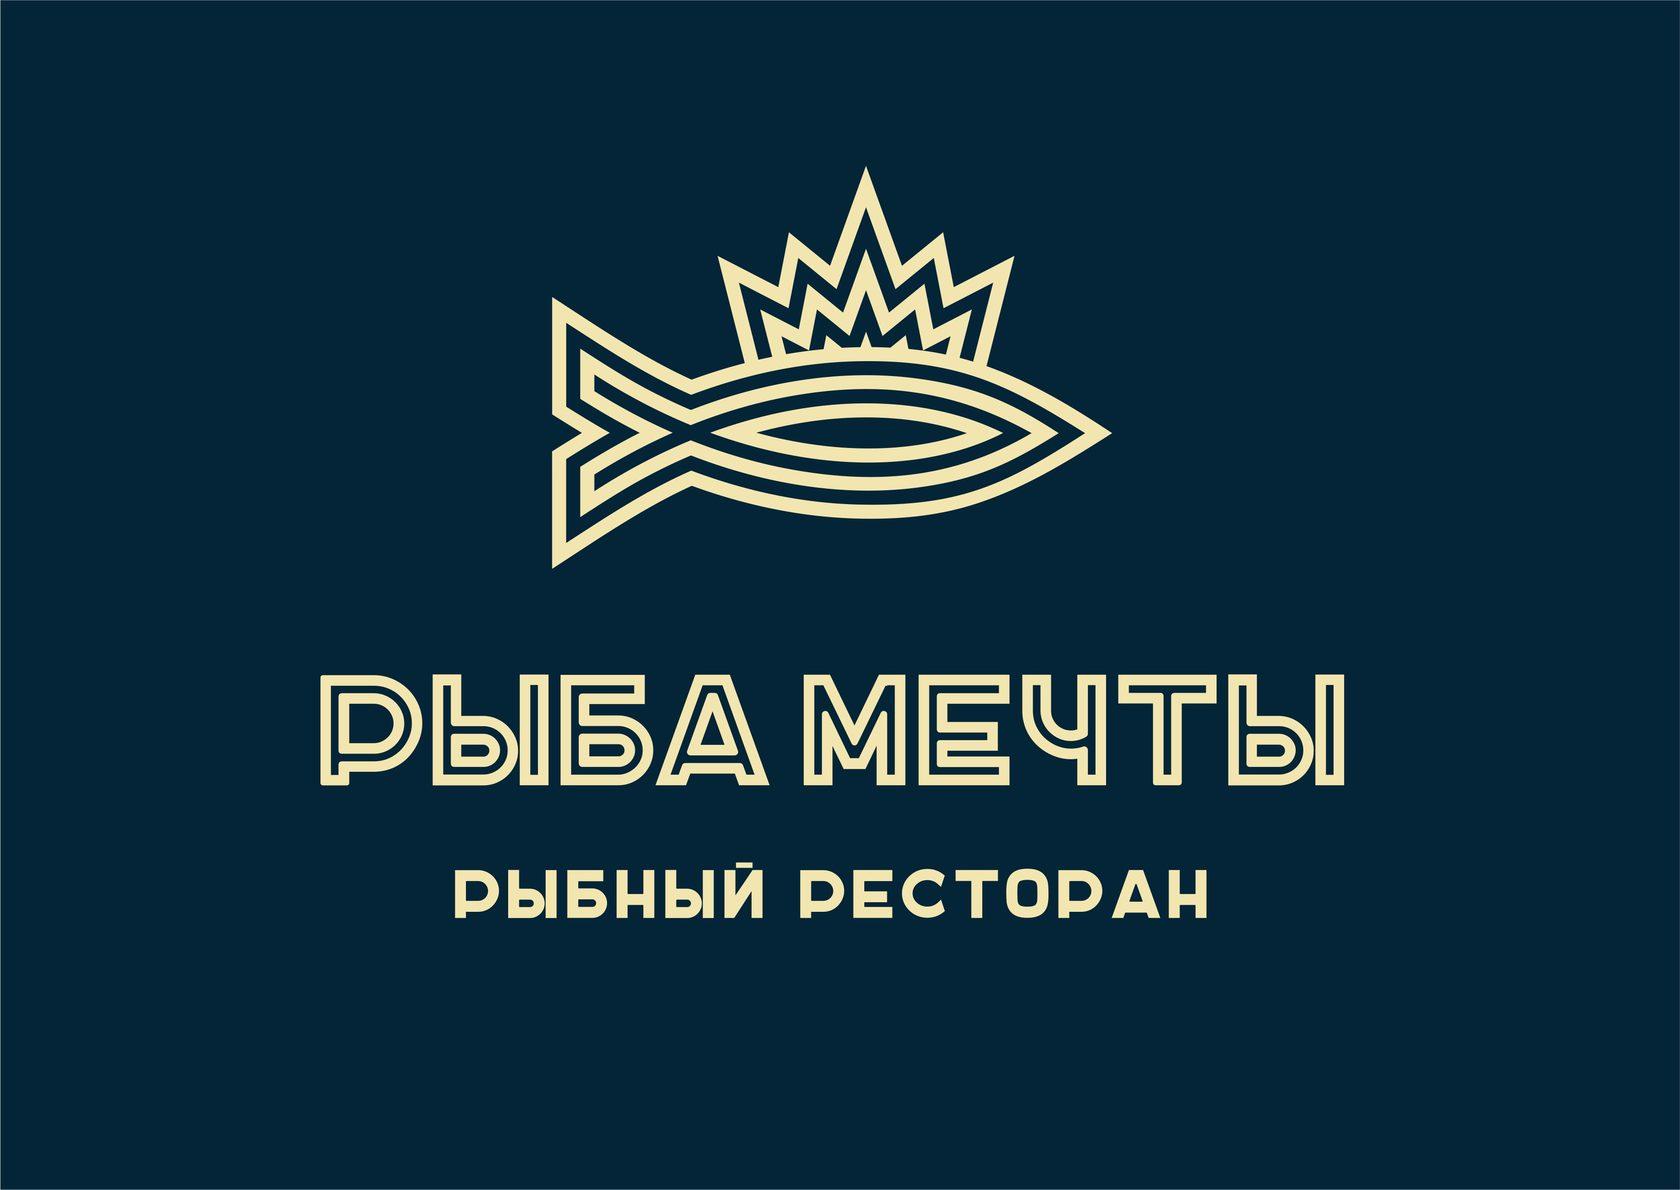 (c) Dreamfish.moscow